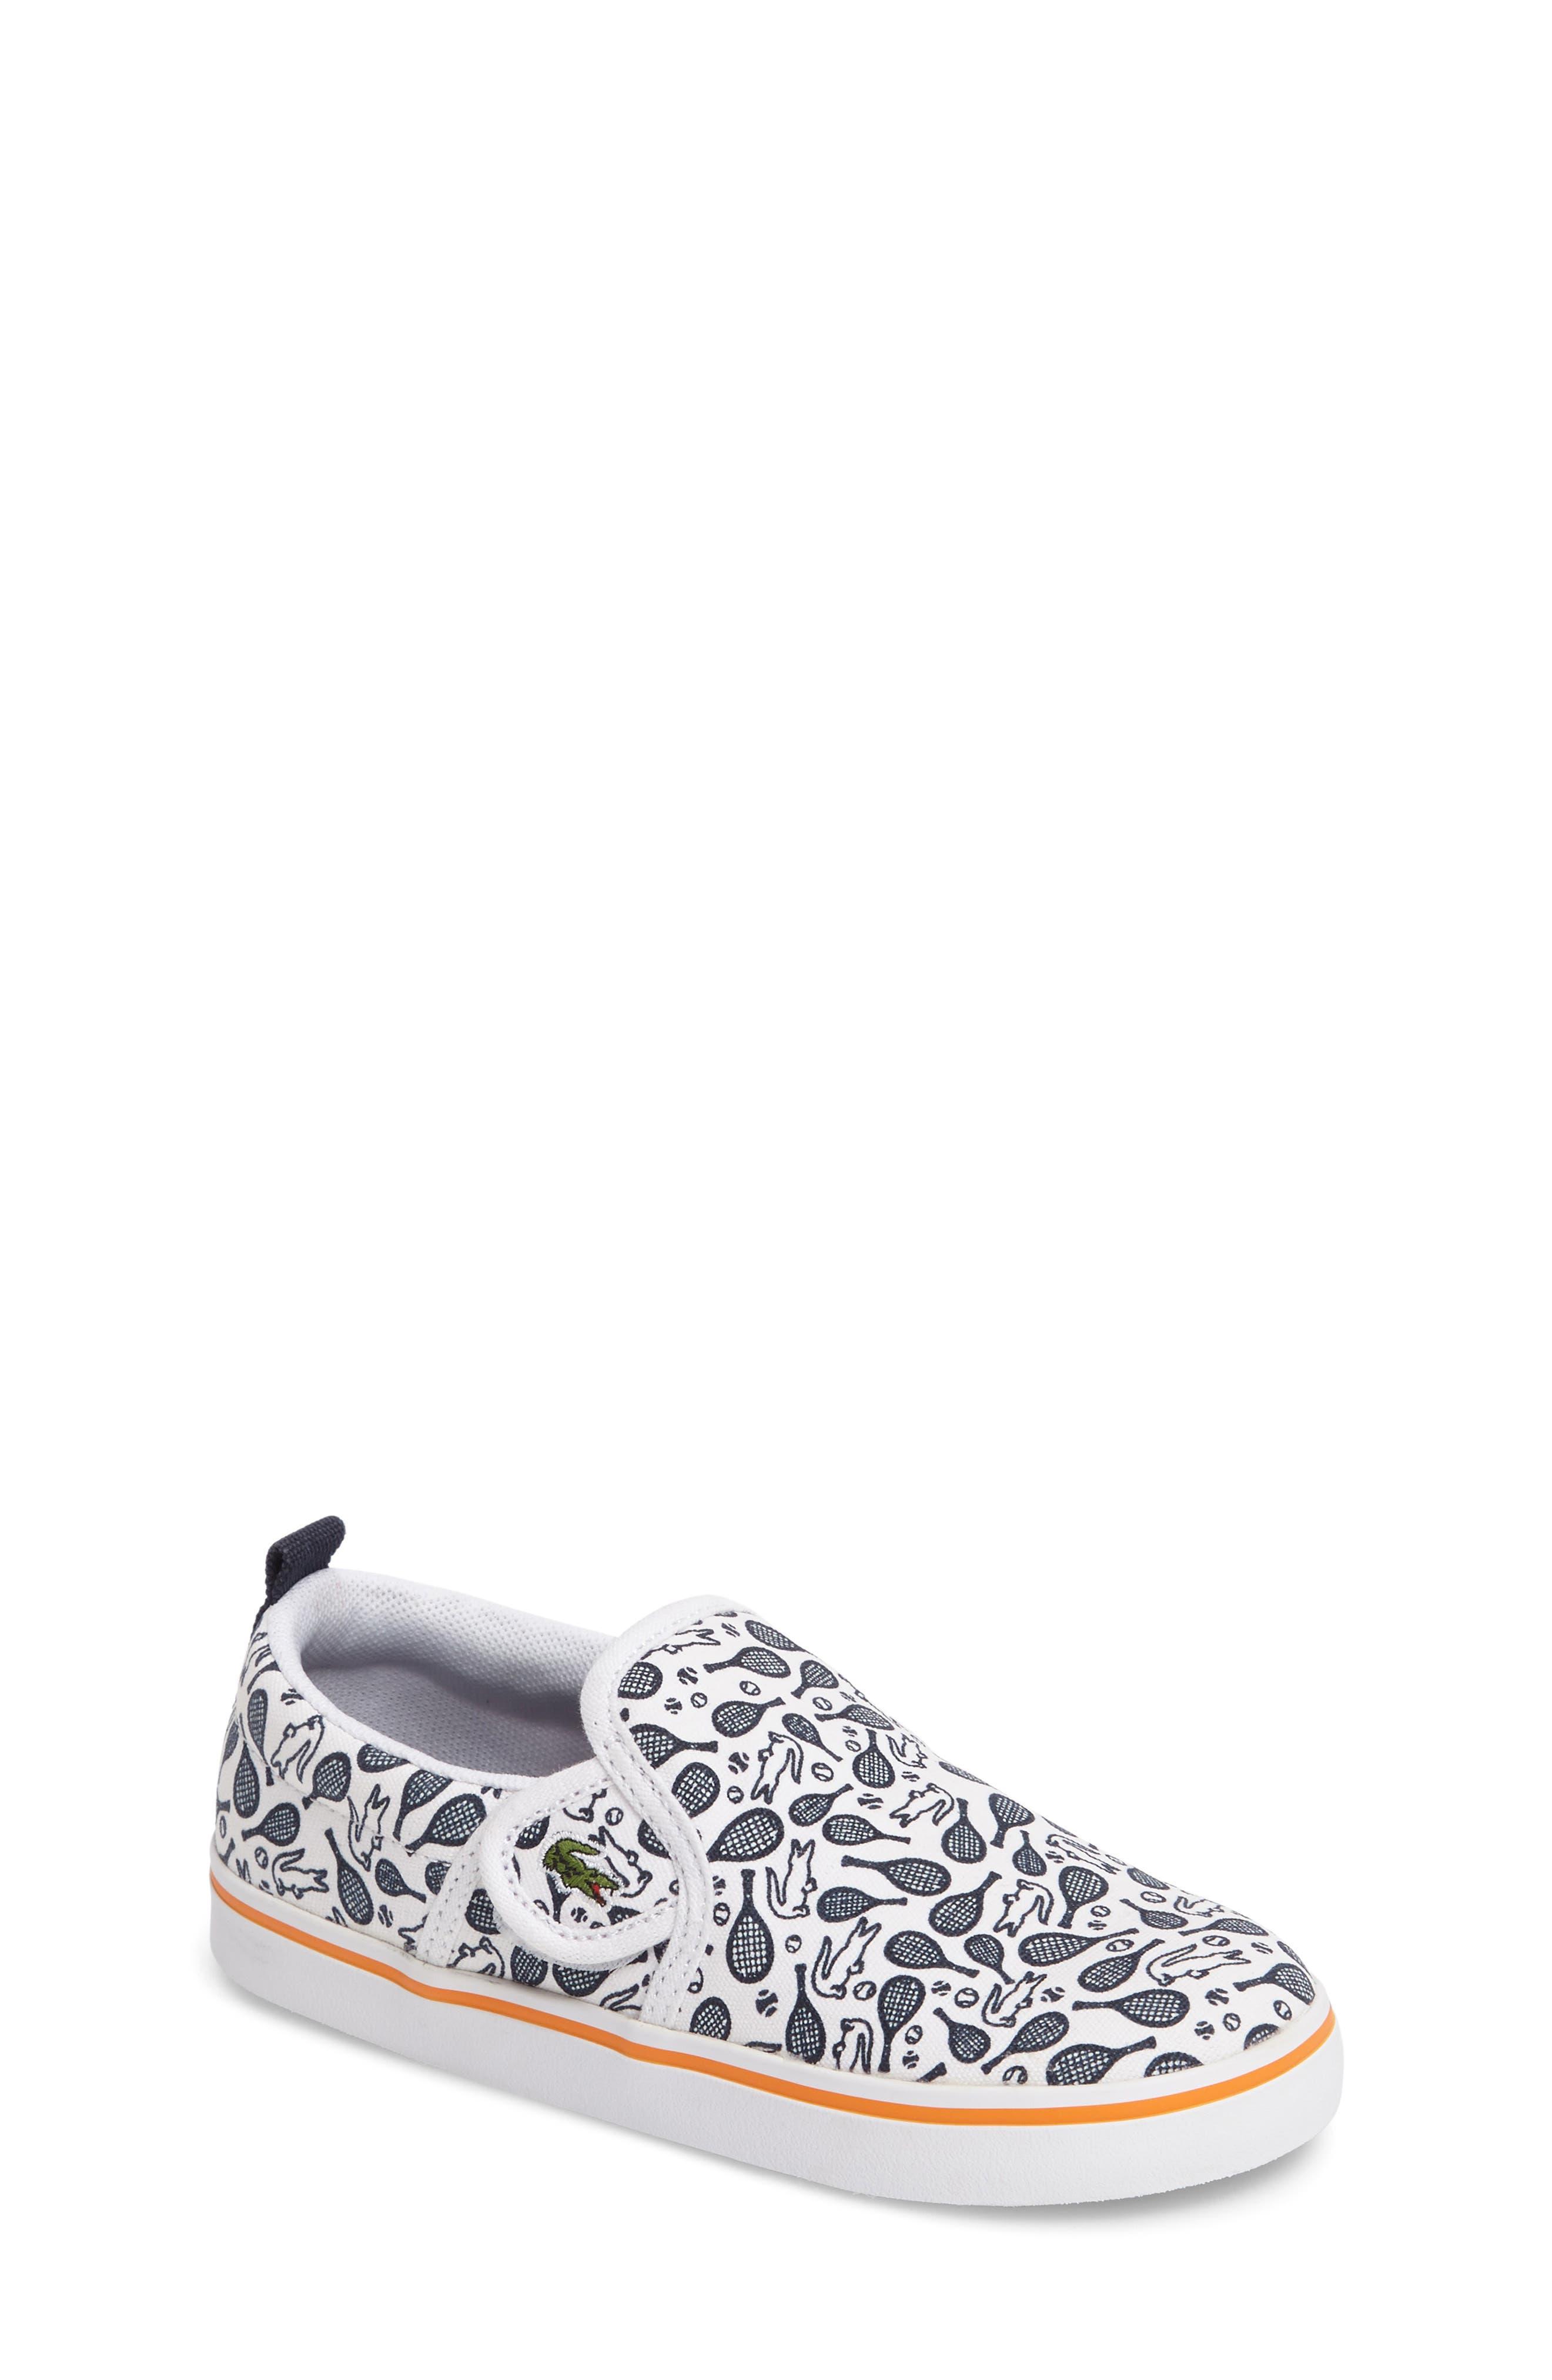 Lacoste Gazon Slip-On Sneaker (Baby, Walker & Toddler)